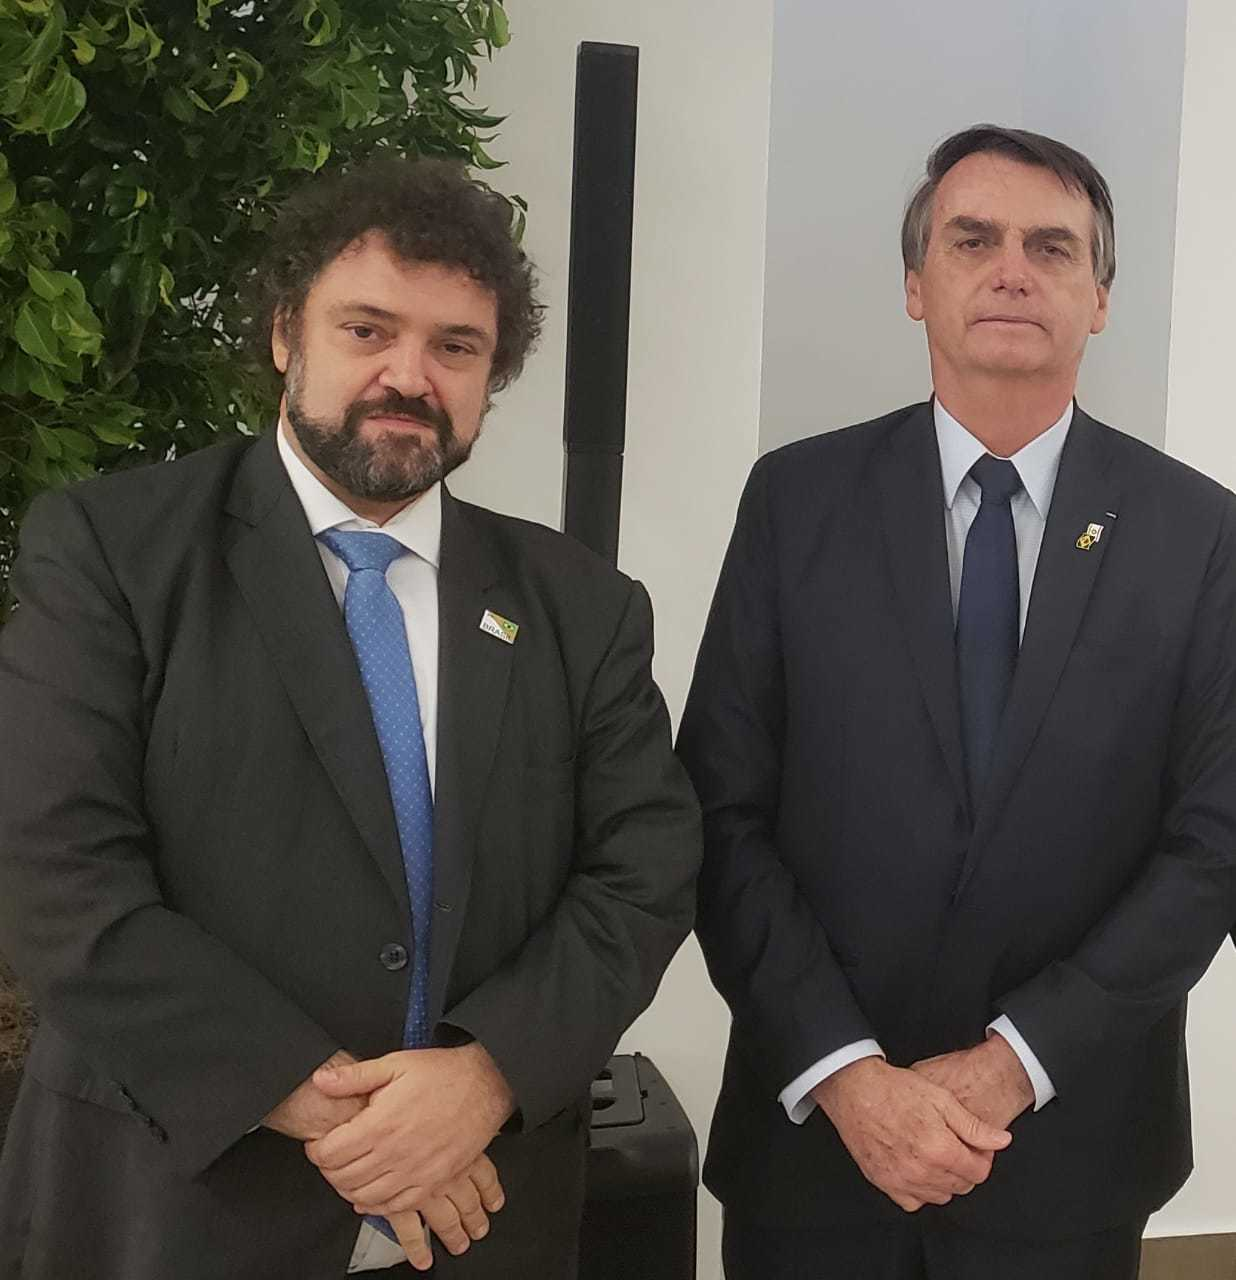 LAJC Executive Vice President Claudio Epelman and Brazilian President Jair Bolsanaro.